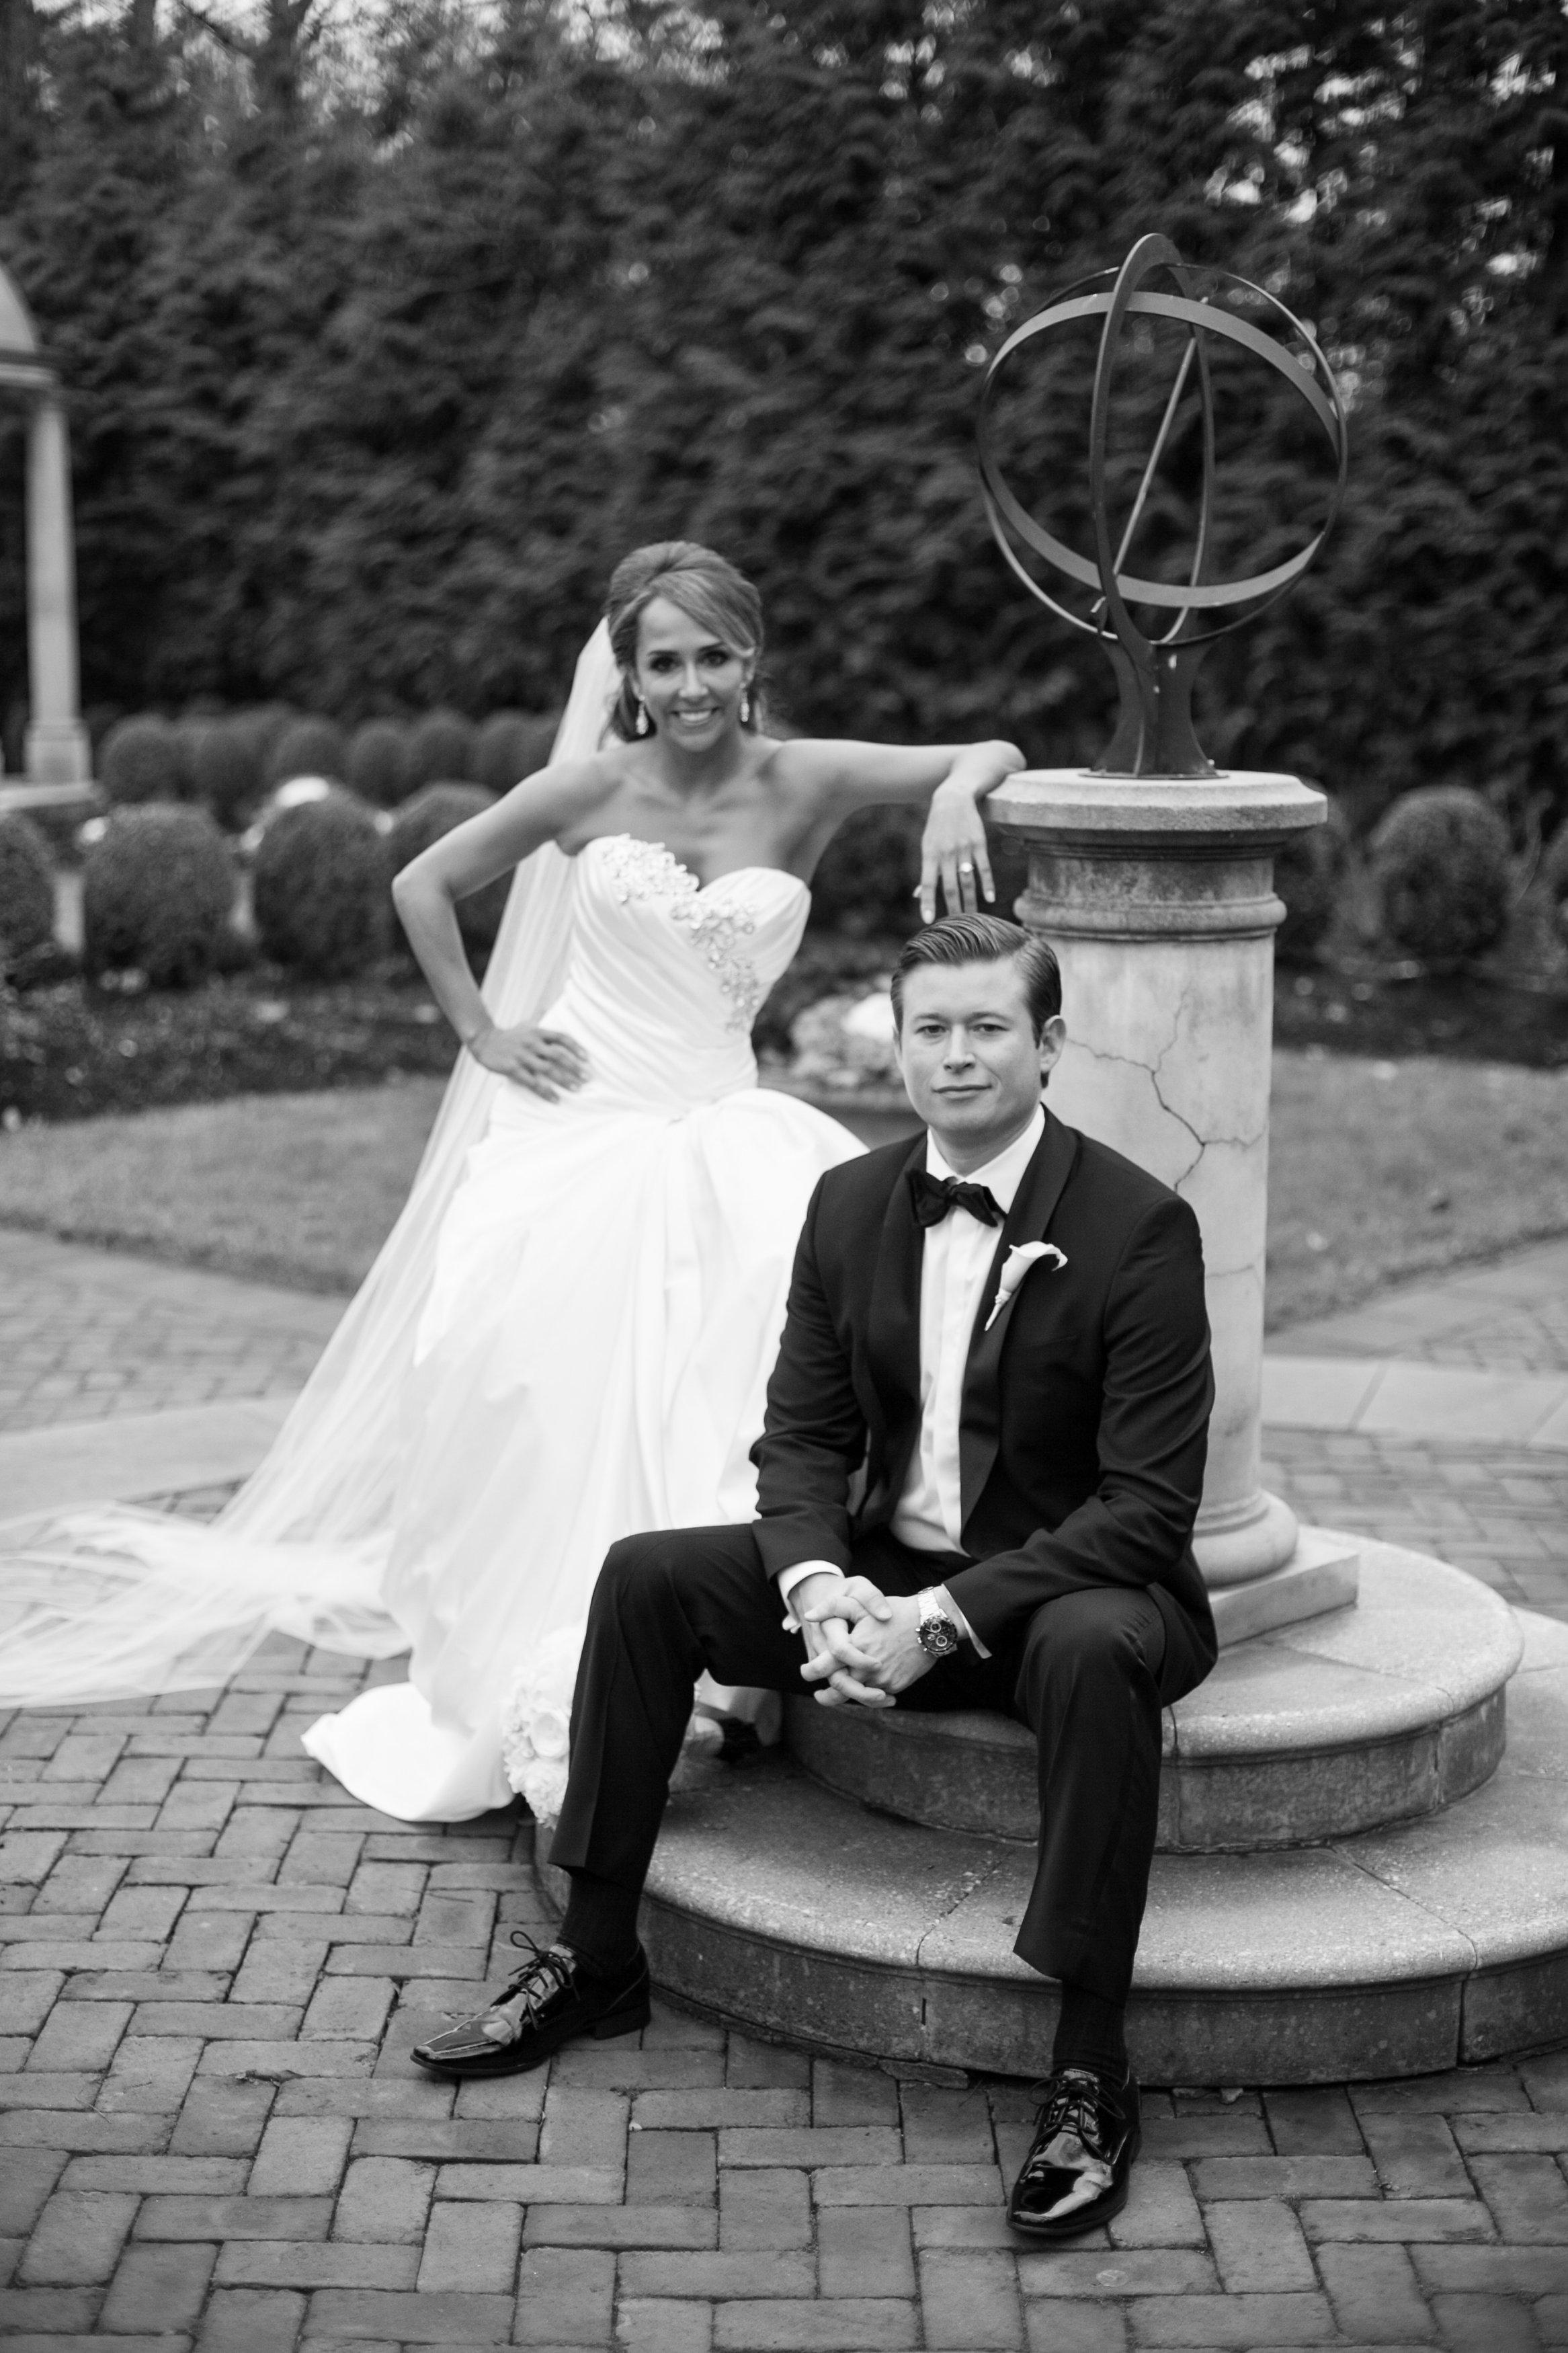 Ceci_New_York_Custom_Invitation_ New_Jersey_Wedding_Luxury_Personalized_Ceci_Style_Bride_Foil_Stamping147.JPG